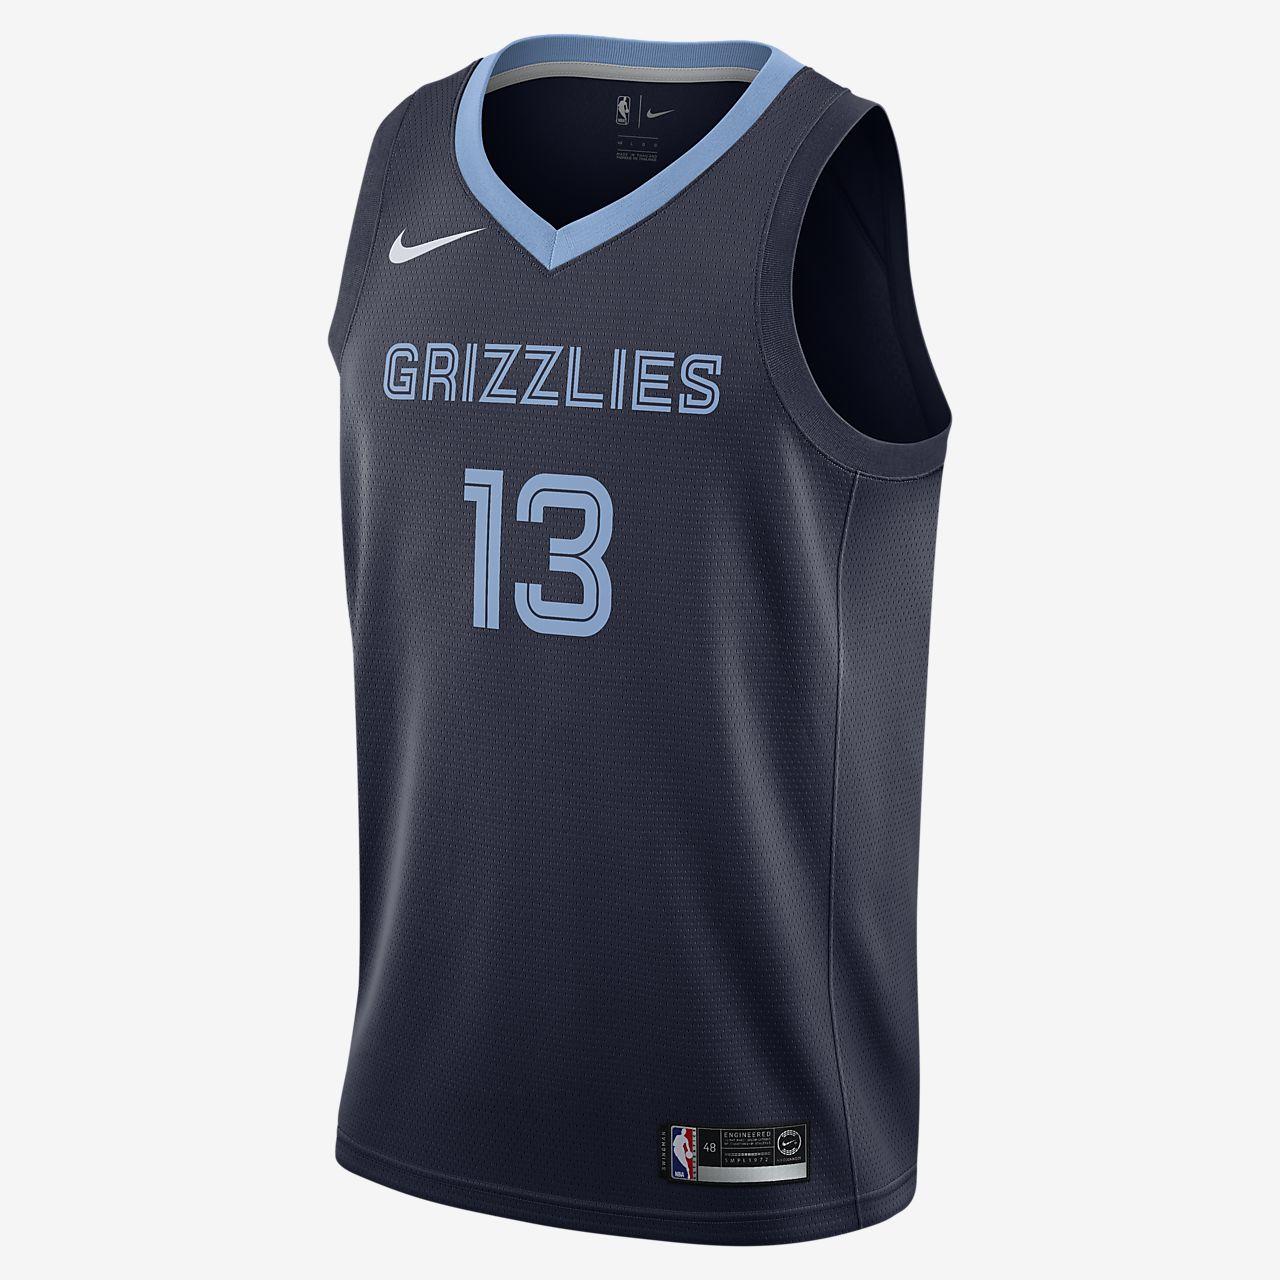 grizzlies jersey